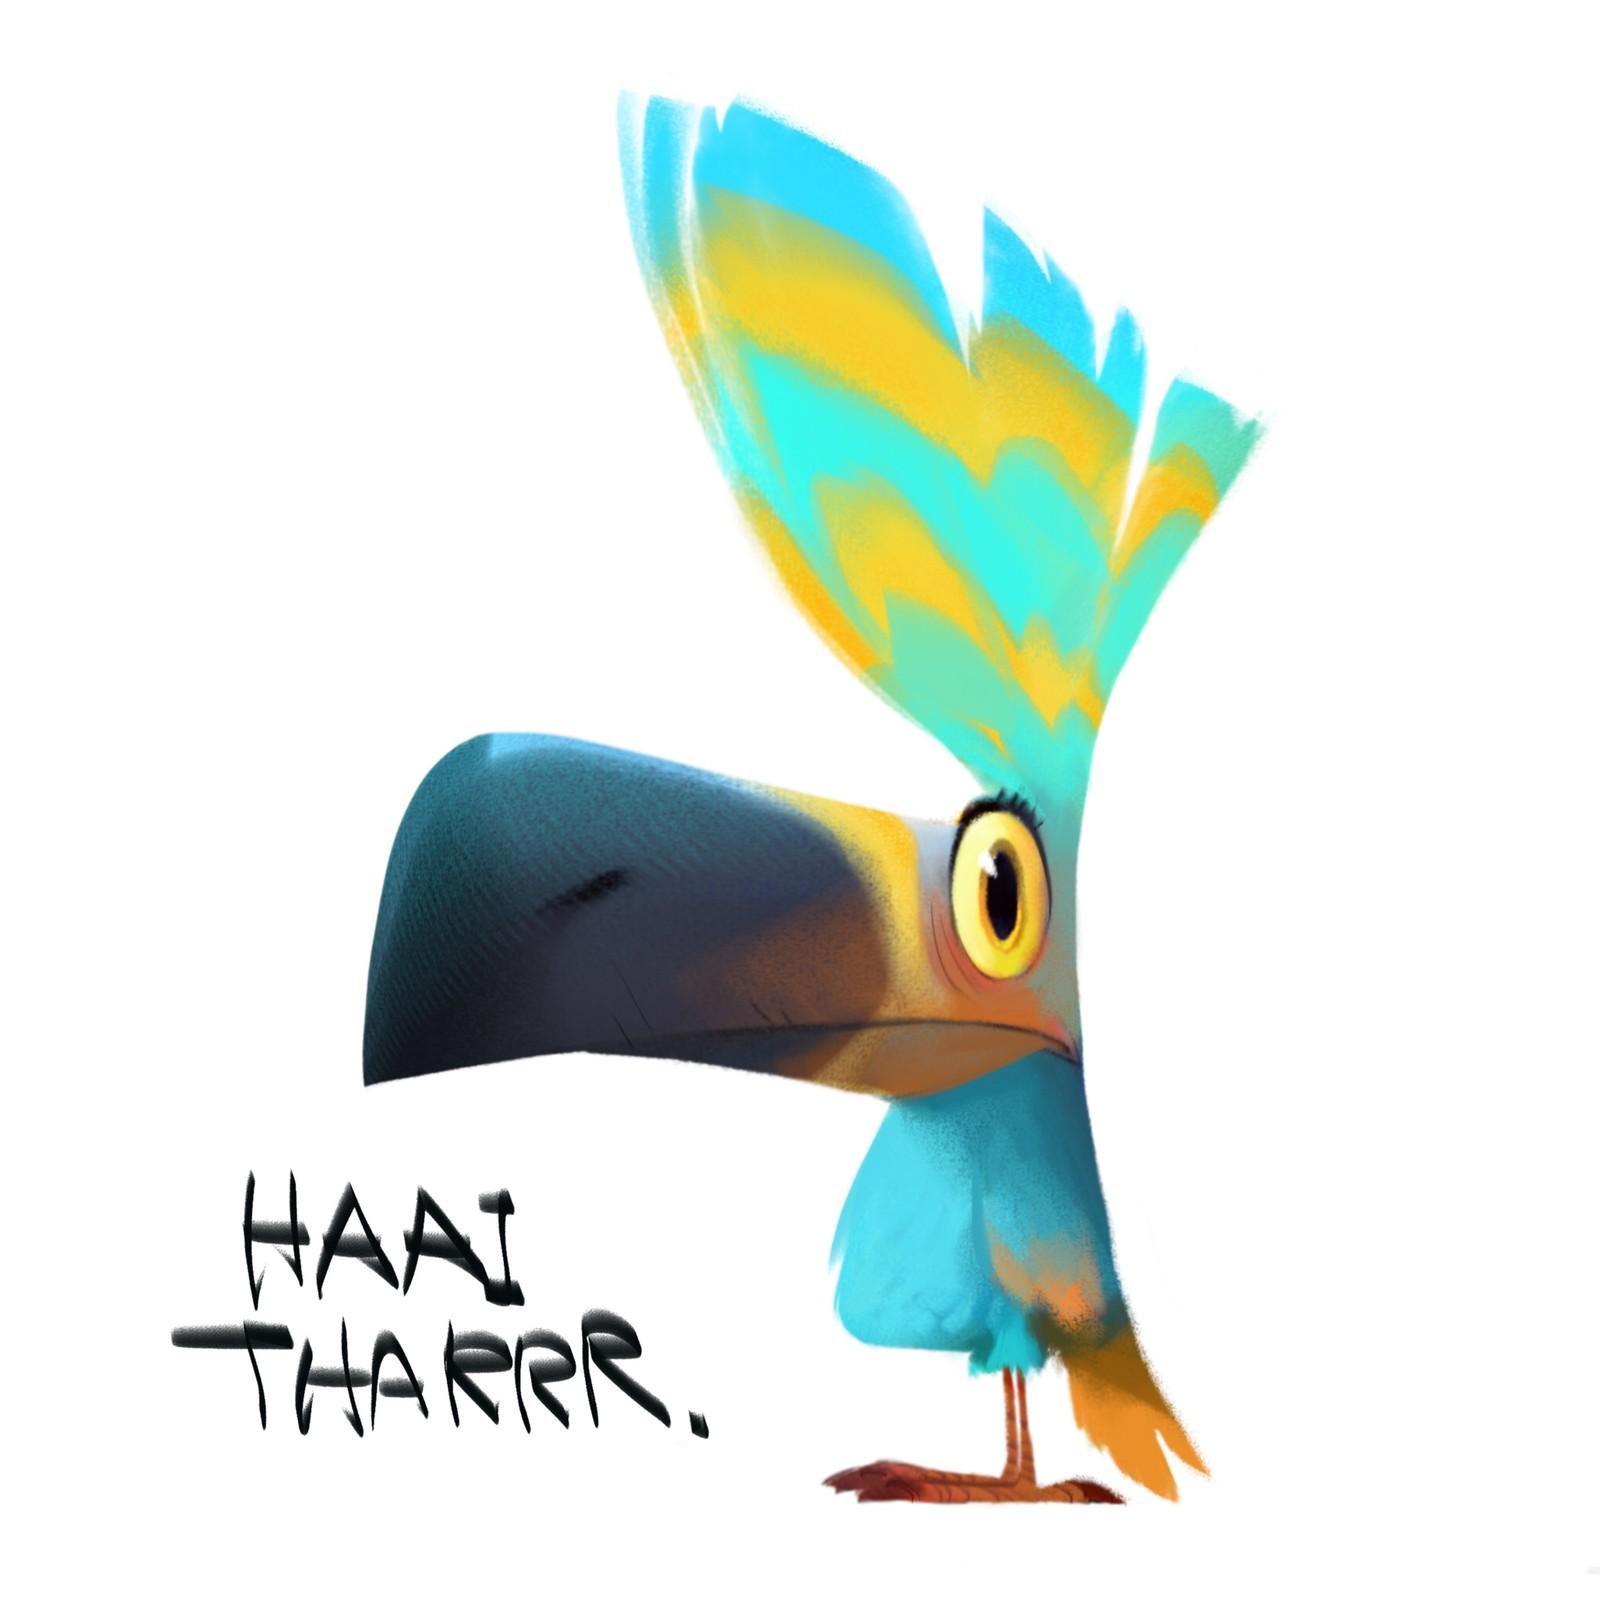 HAAI THARRR!